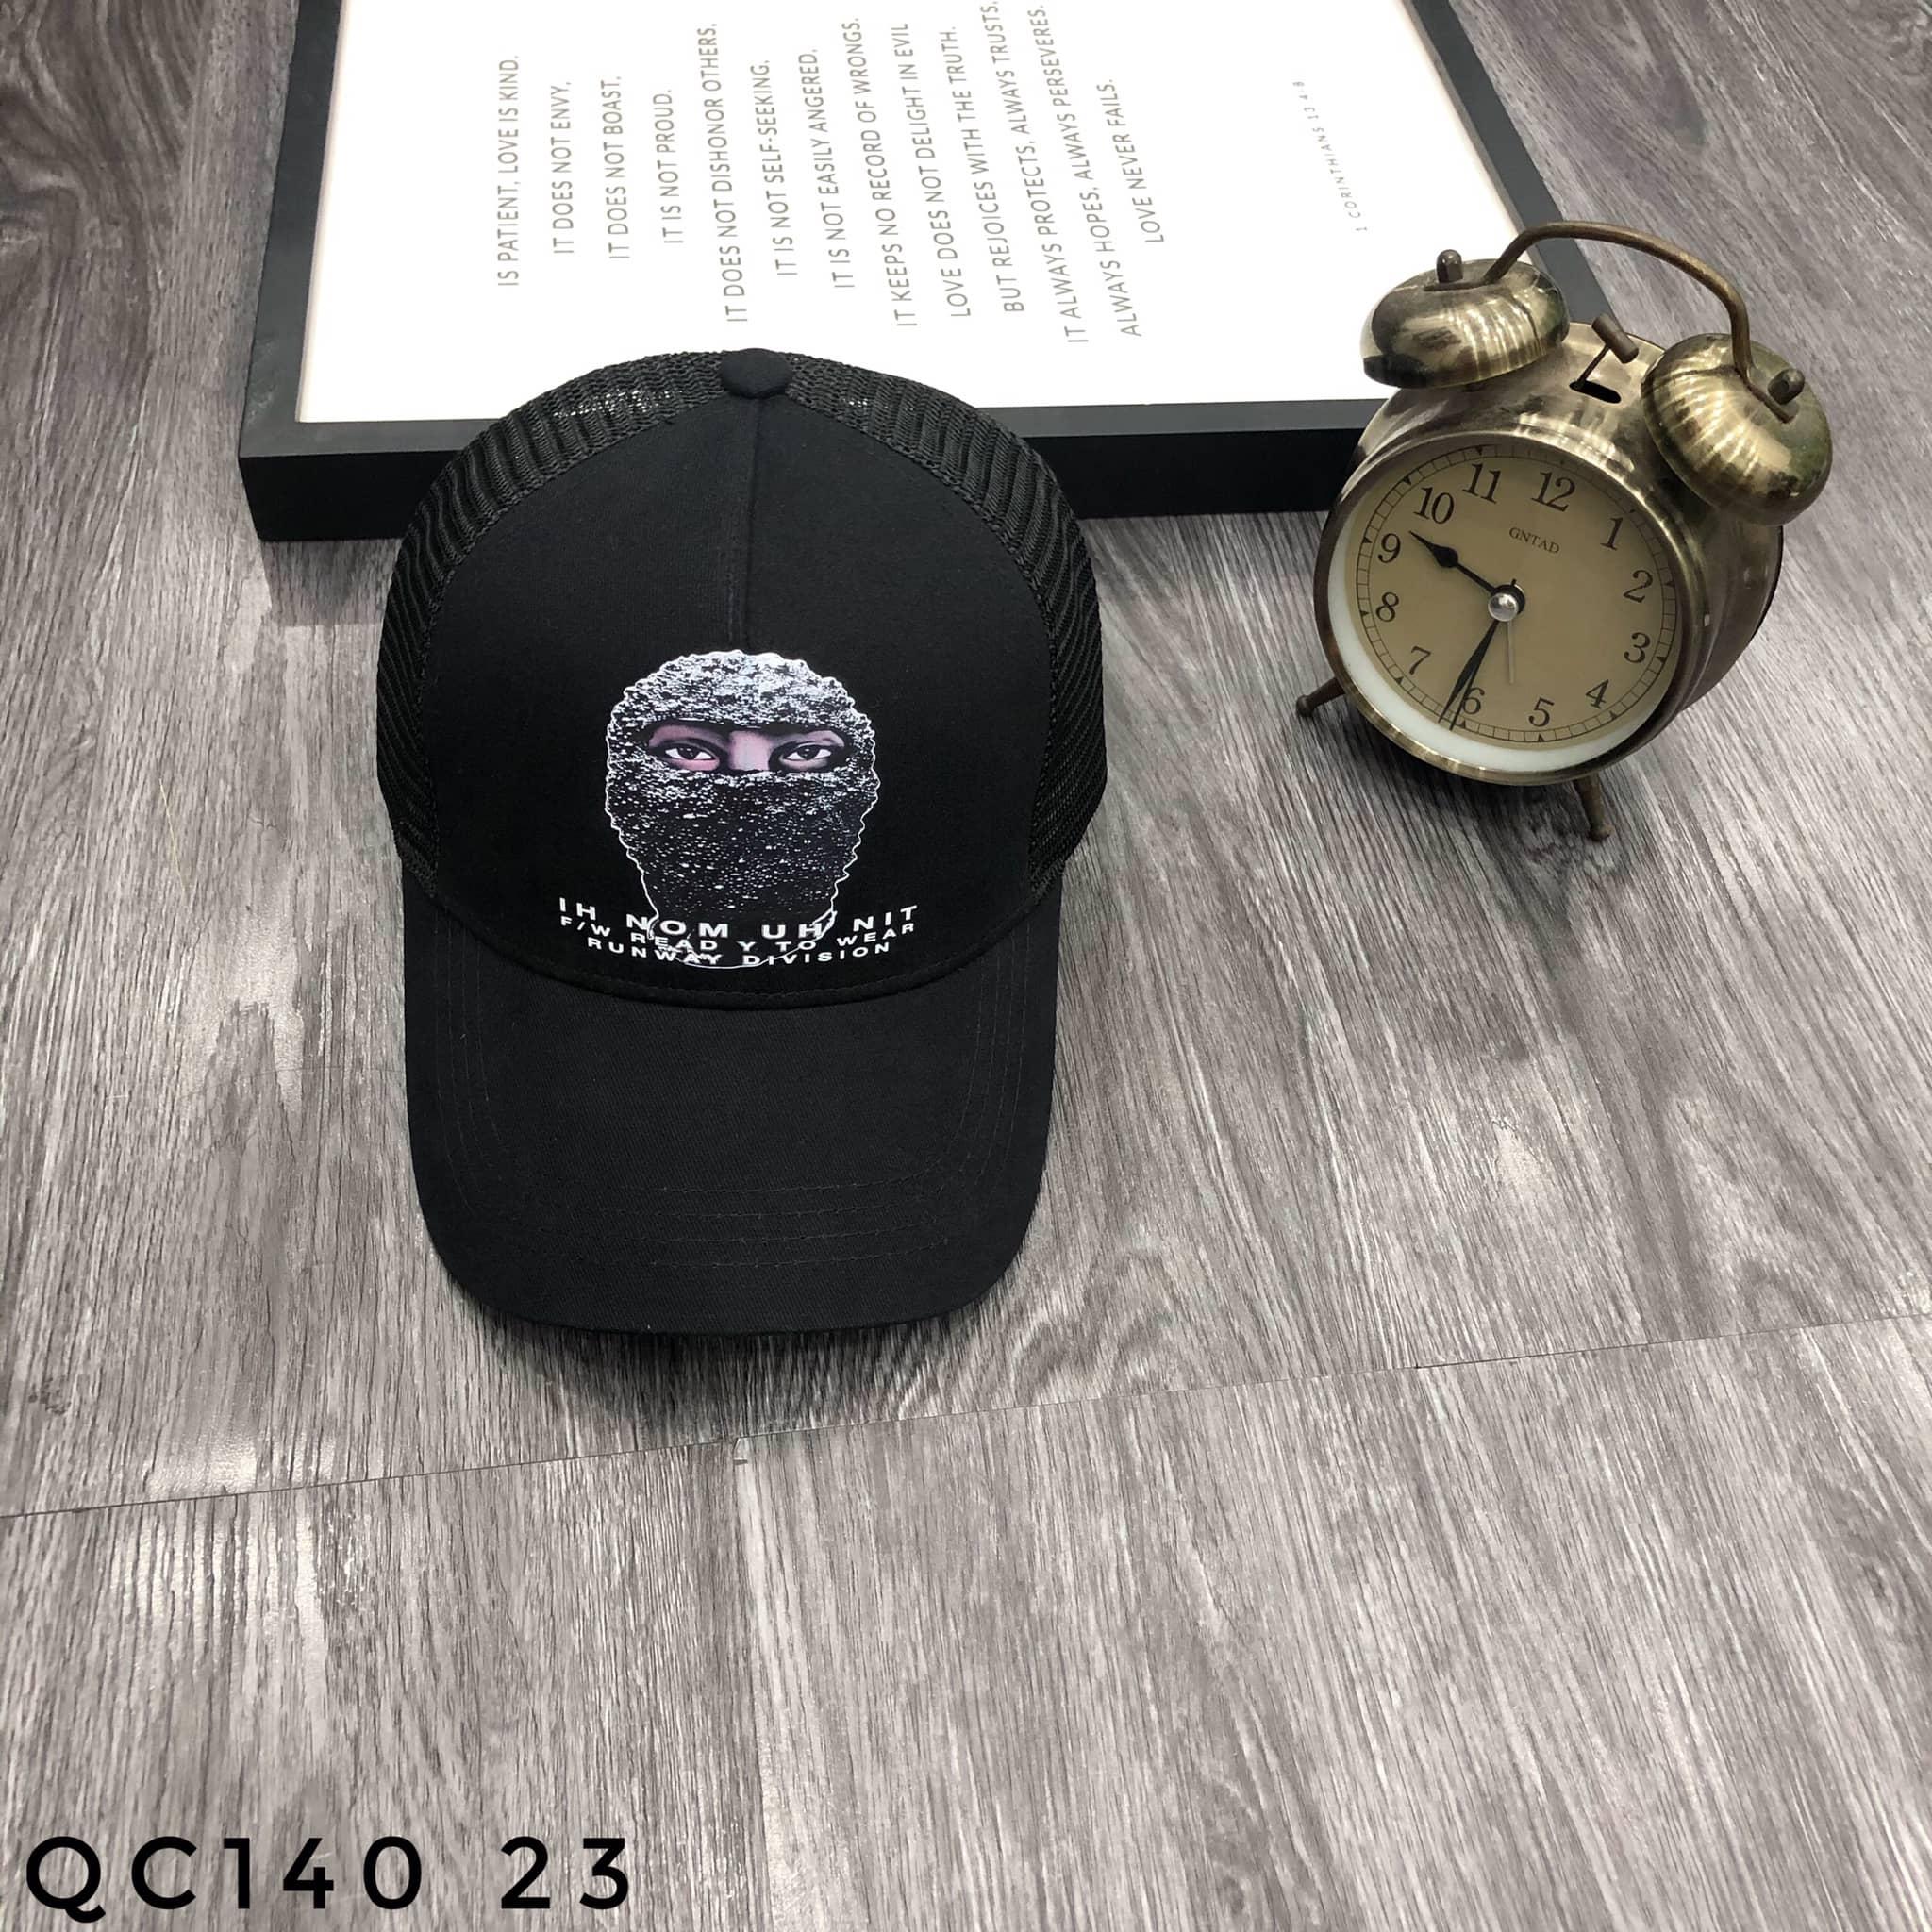 NÓN QC140